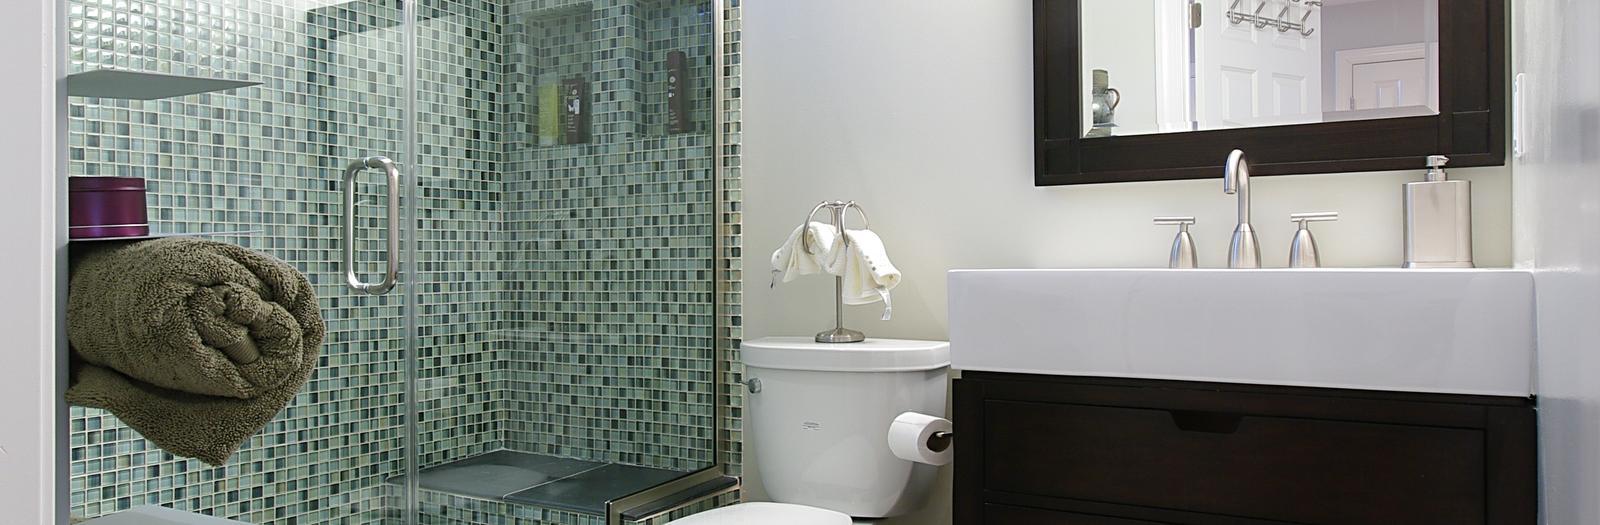 Contemporary Bathroom With Dark Wood Framed Vanity Mirror